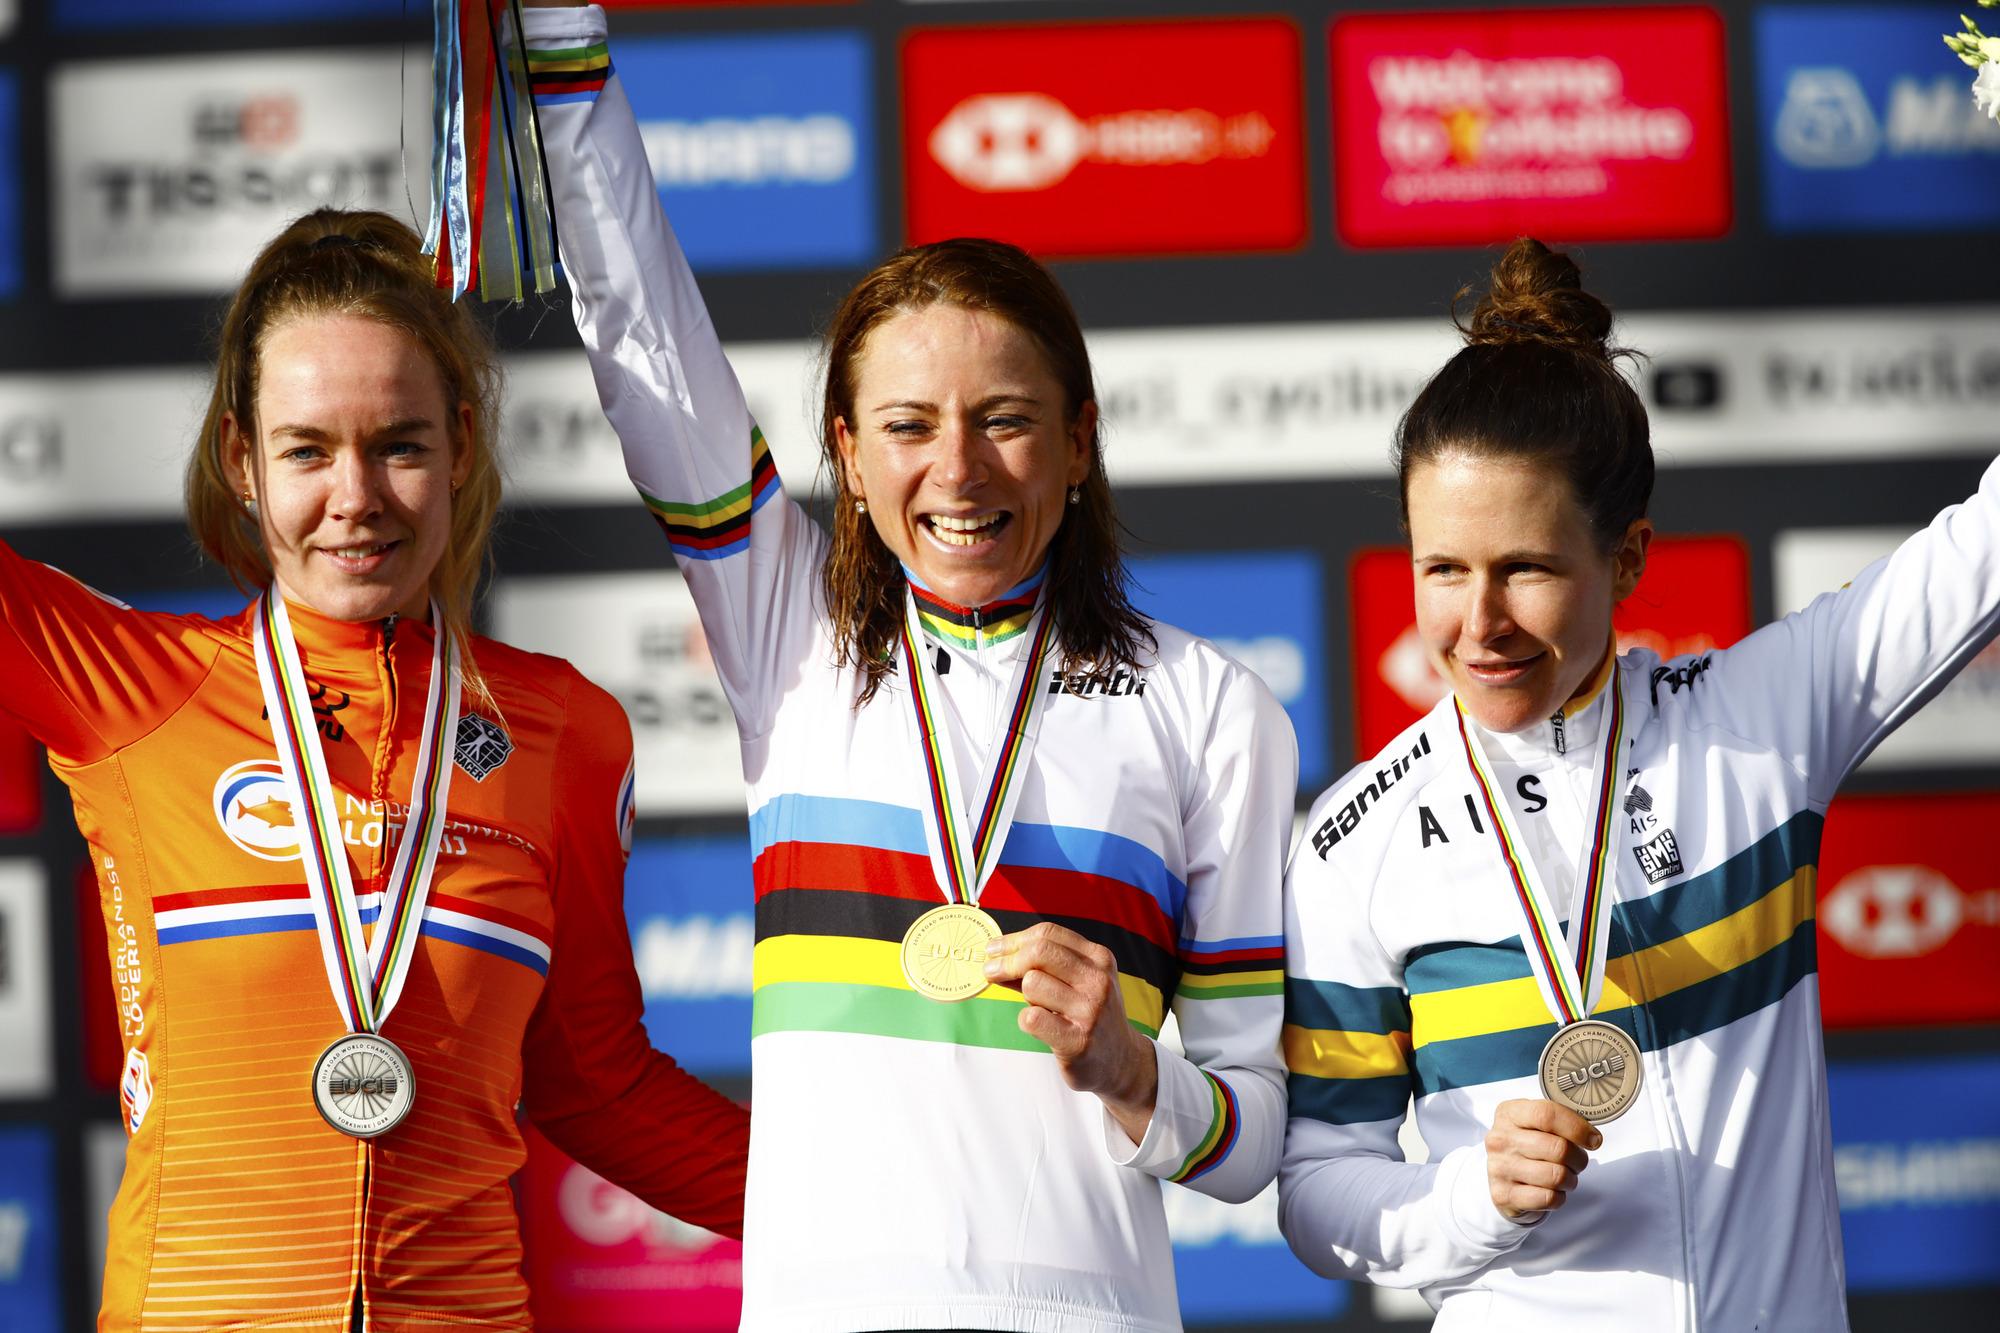 Annemiek van Vleuten (Netherlands) atop the podium with Anna van der Breggen and Amanda Spratt